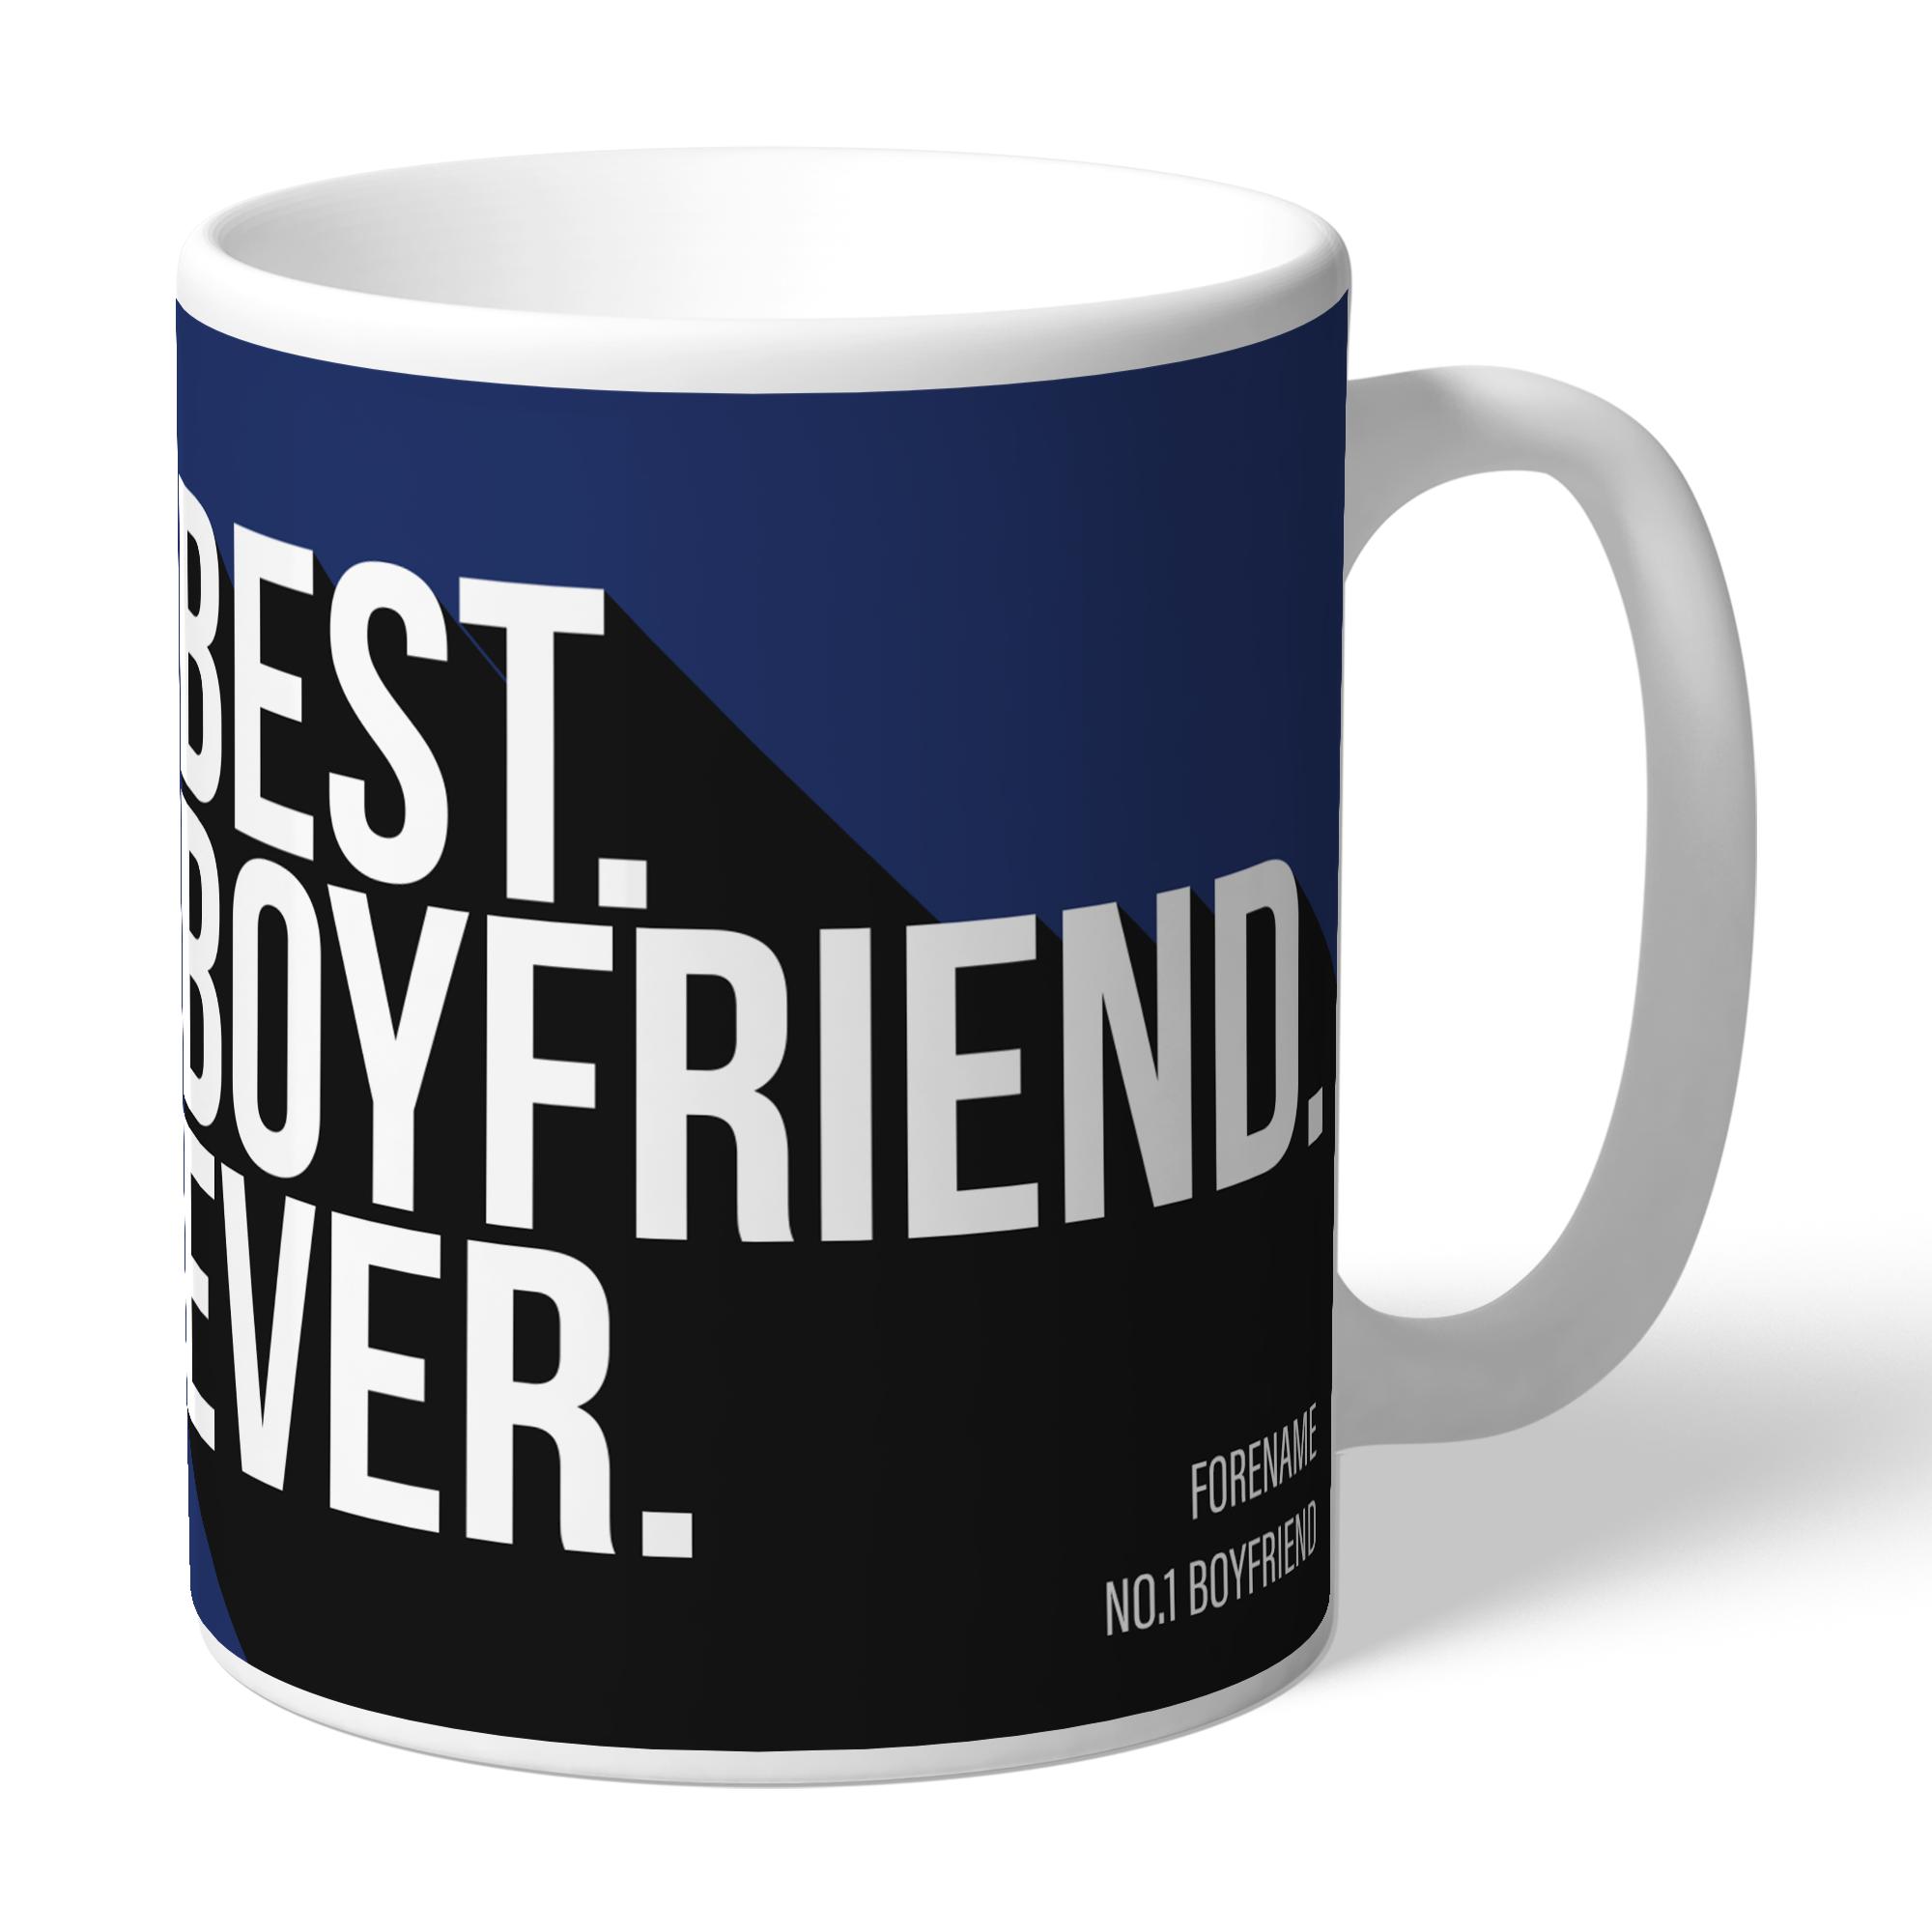 West Bromwich Albion FC Best Boyfriend Ever Mug